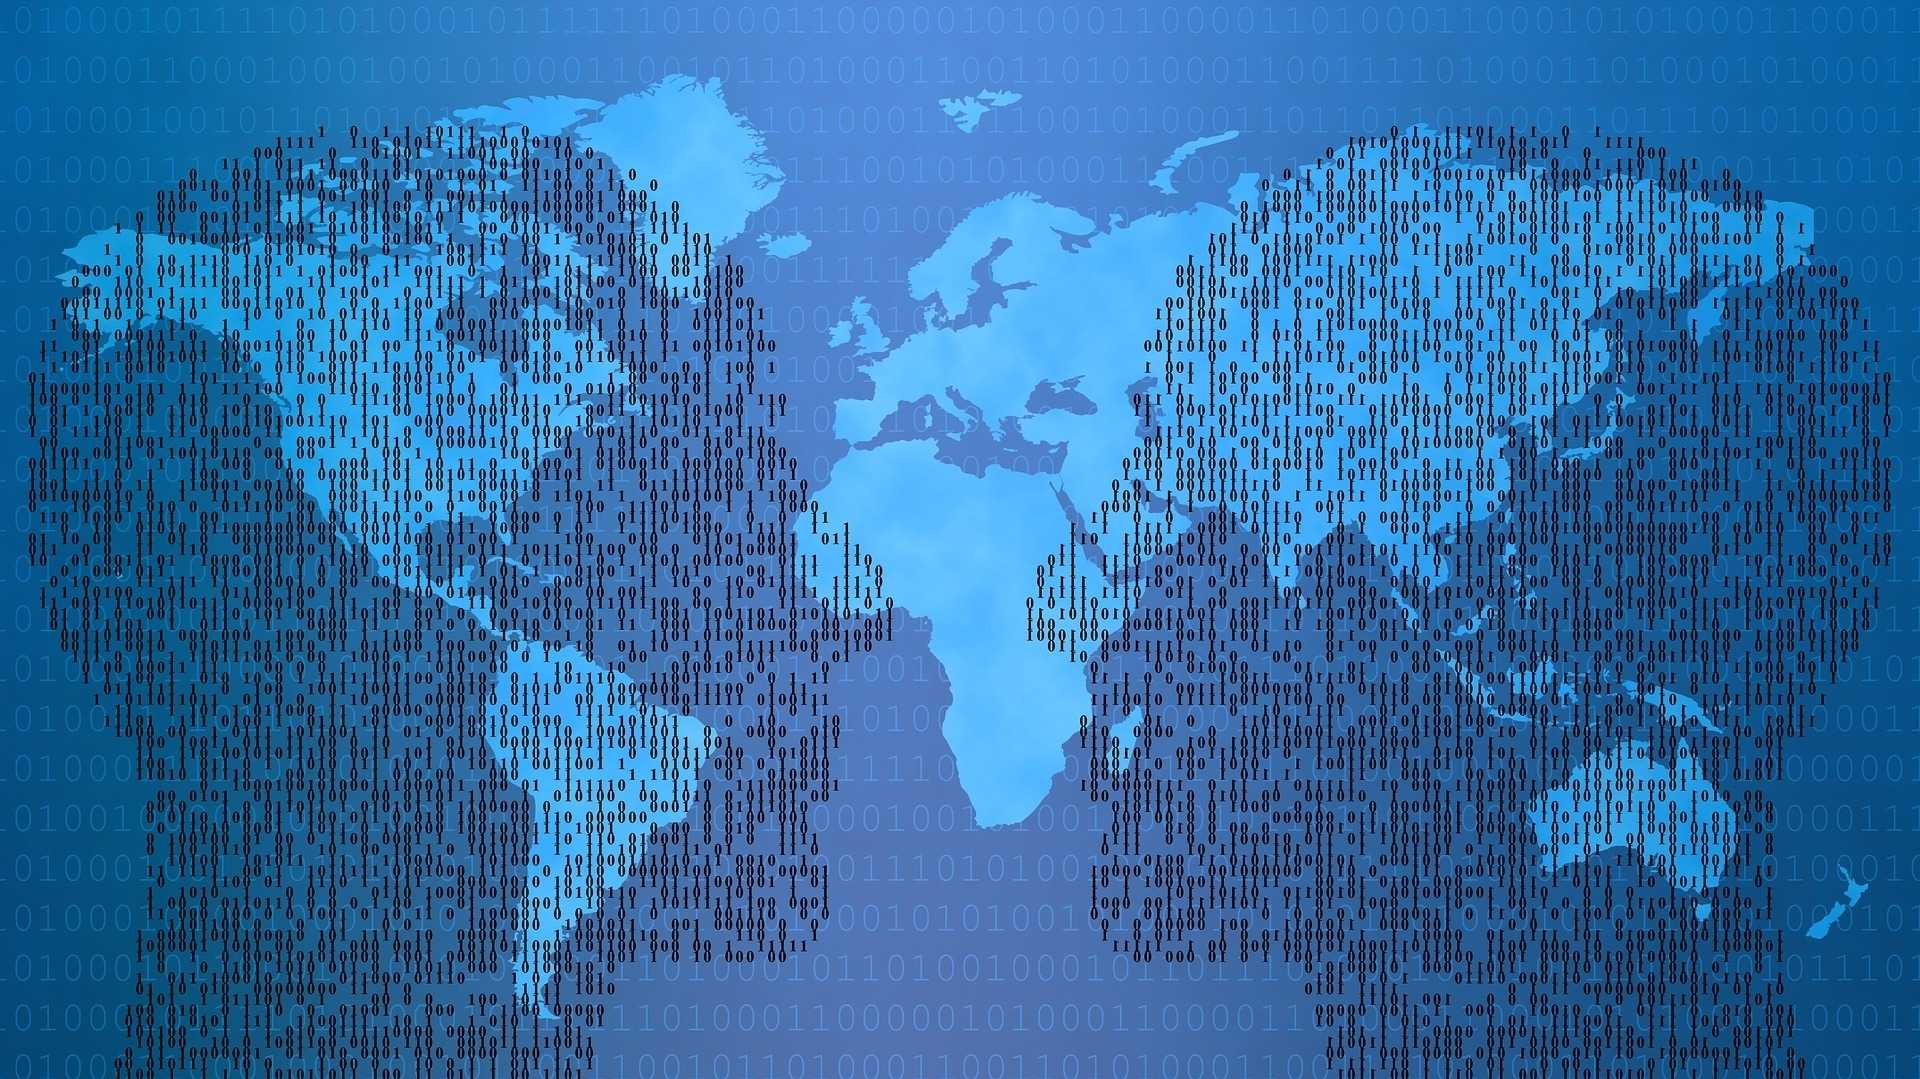 re:publica: Hybride Kriegführung in sozialen Medien